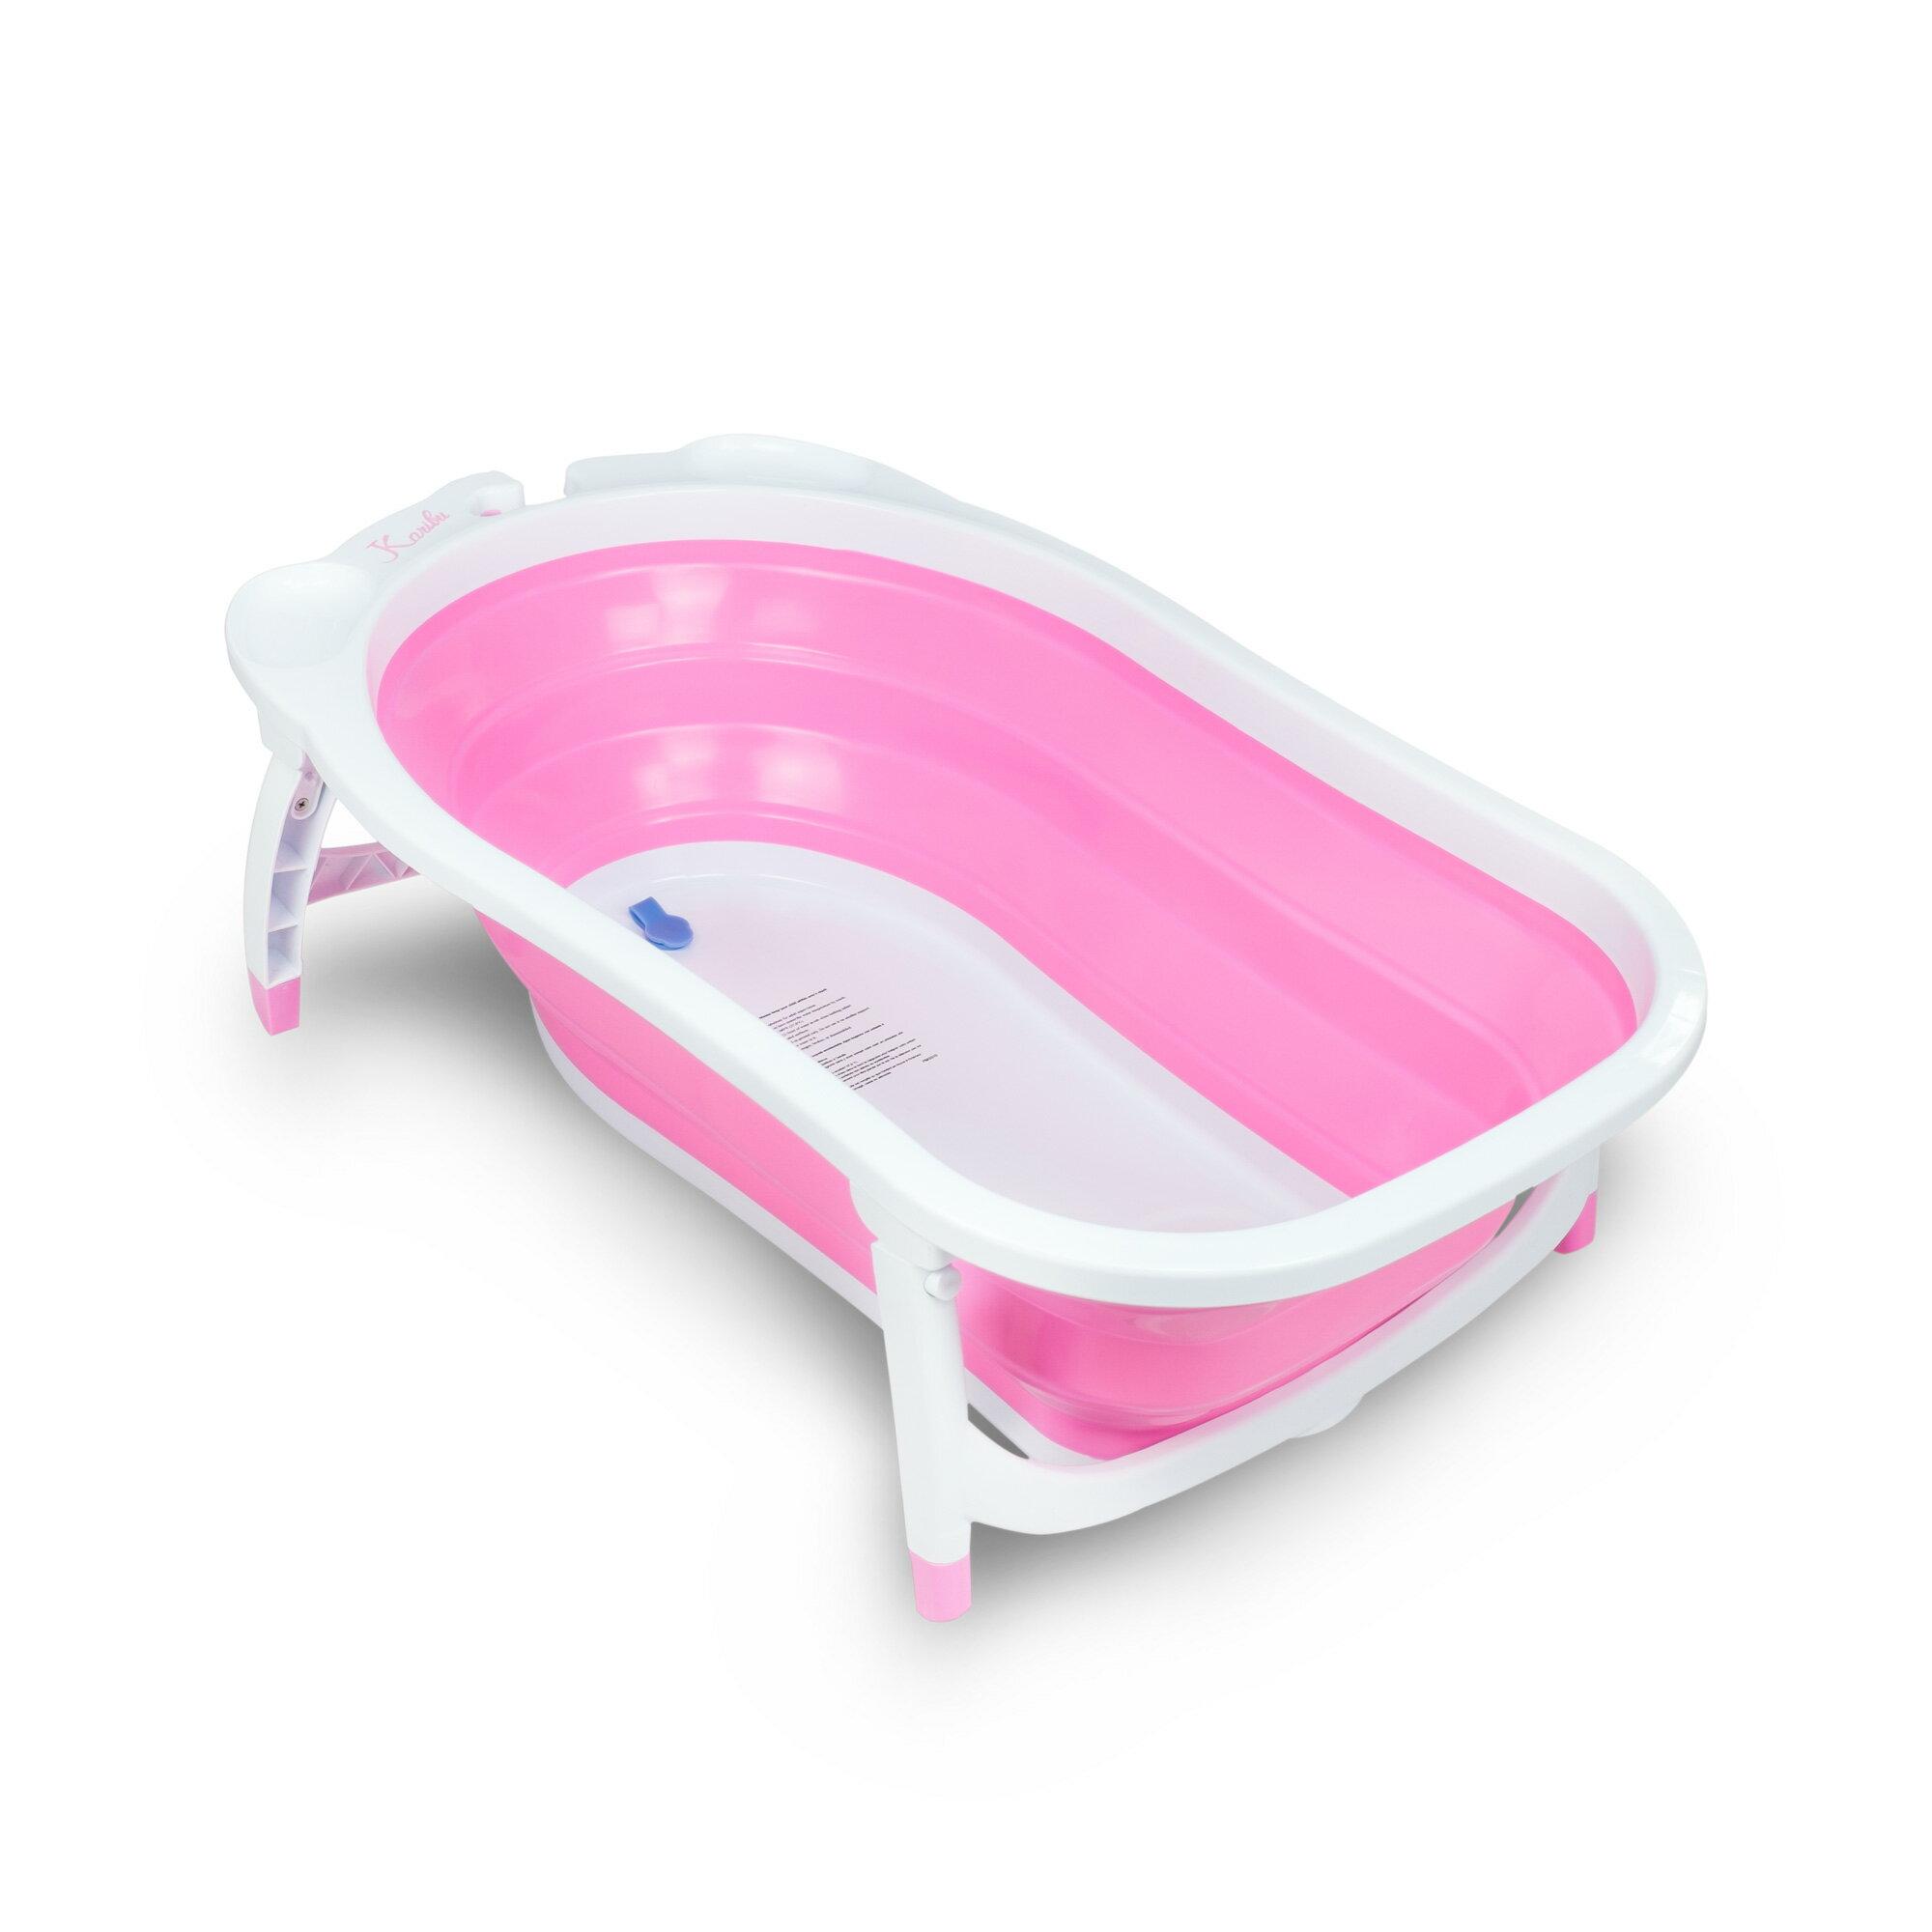 Karibu凱俐寶 時尚折疊式嬰幼浴盆 櫻花粉